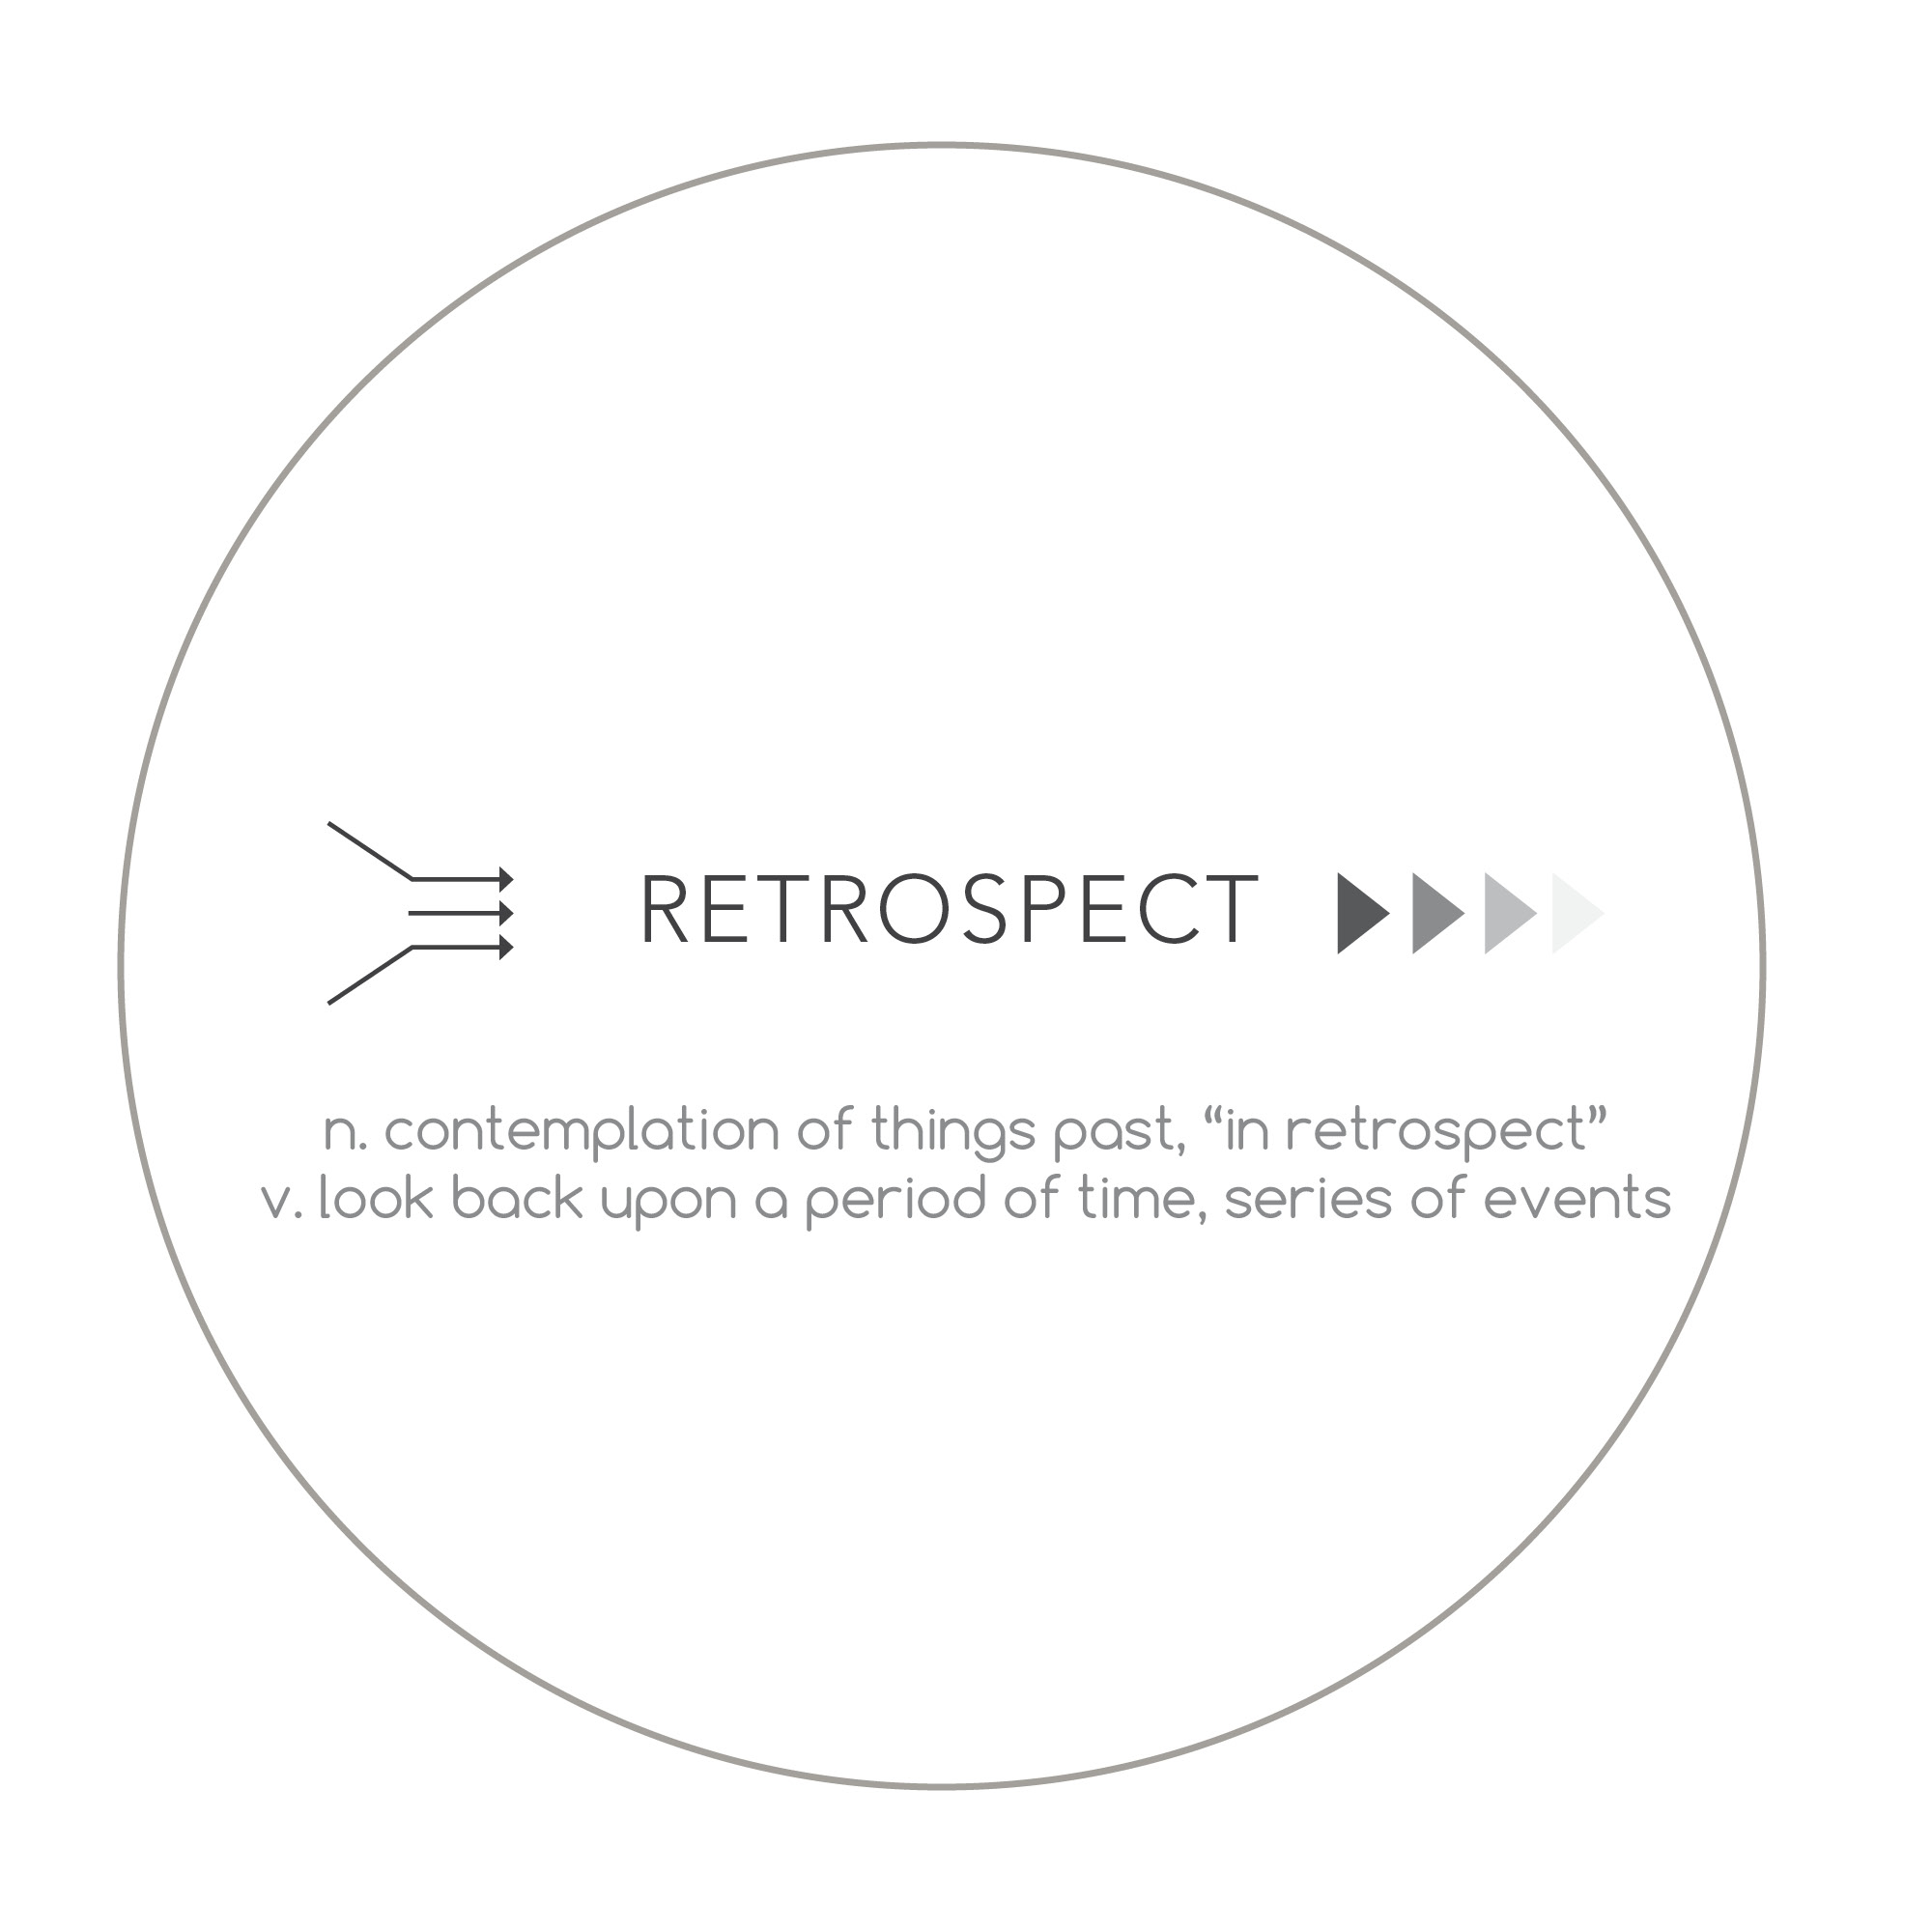 retrospect circle.jpg